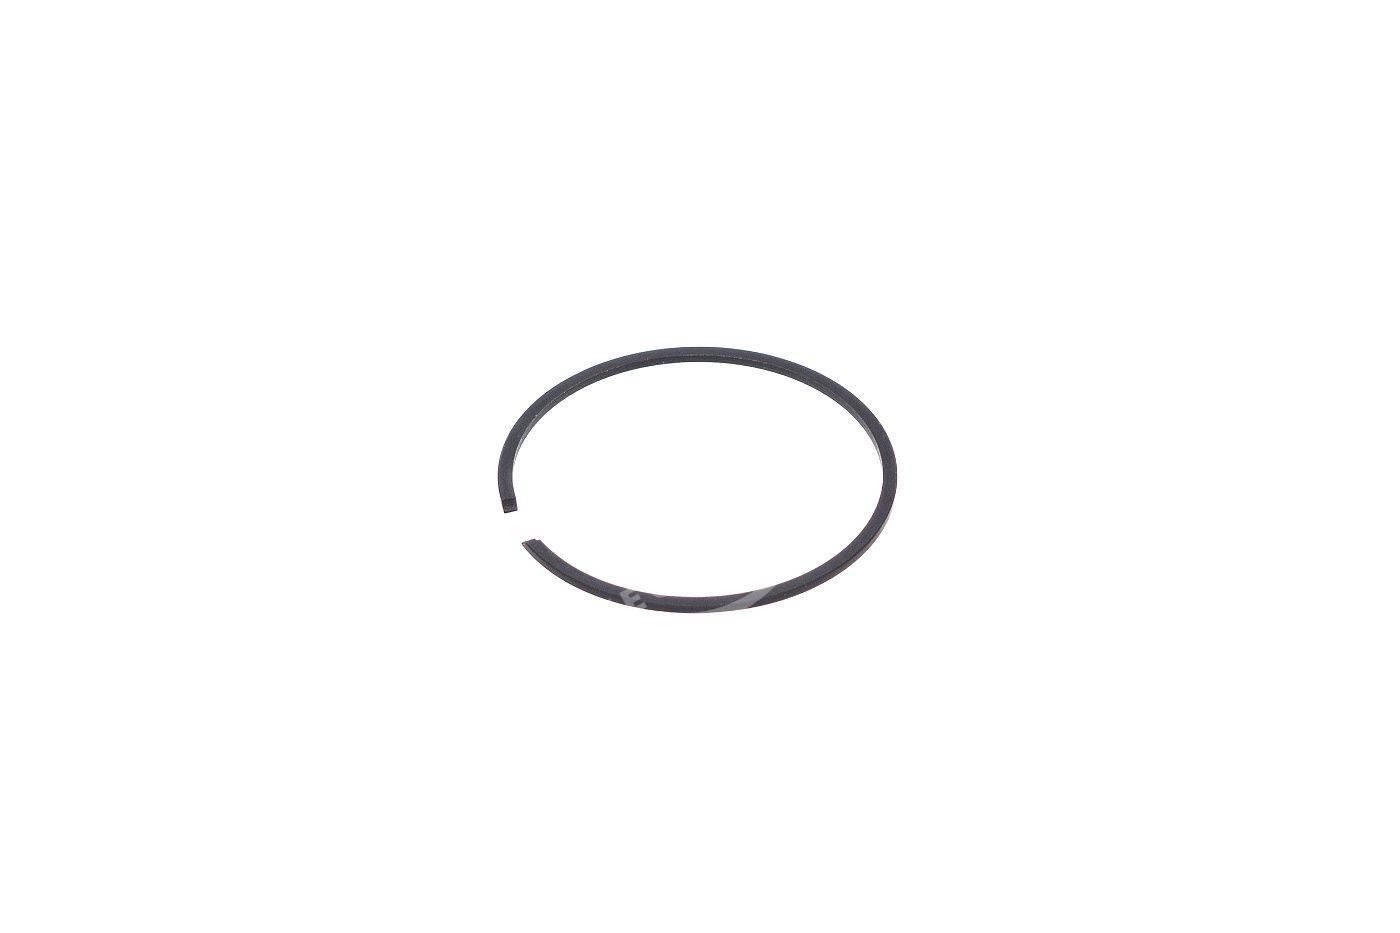 Piestný krúžok 42 x 1,5 mm